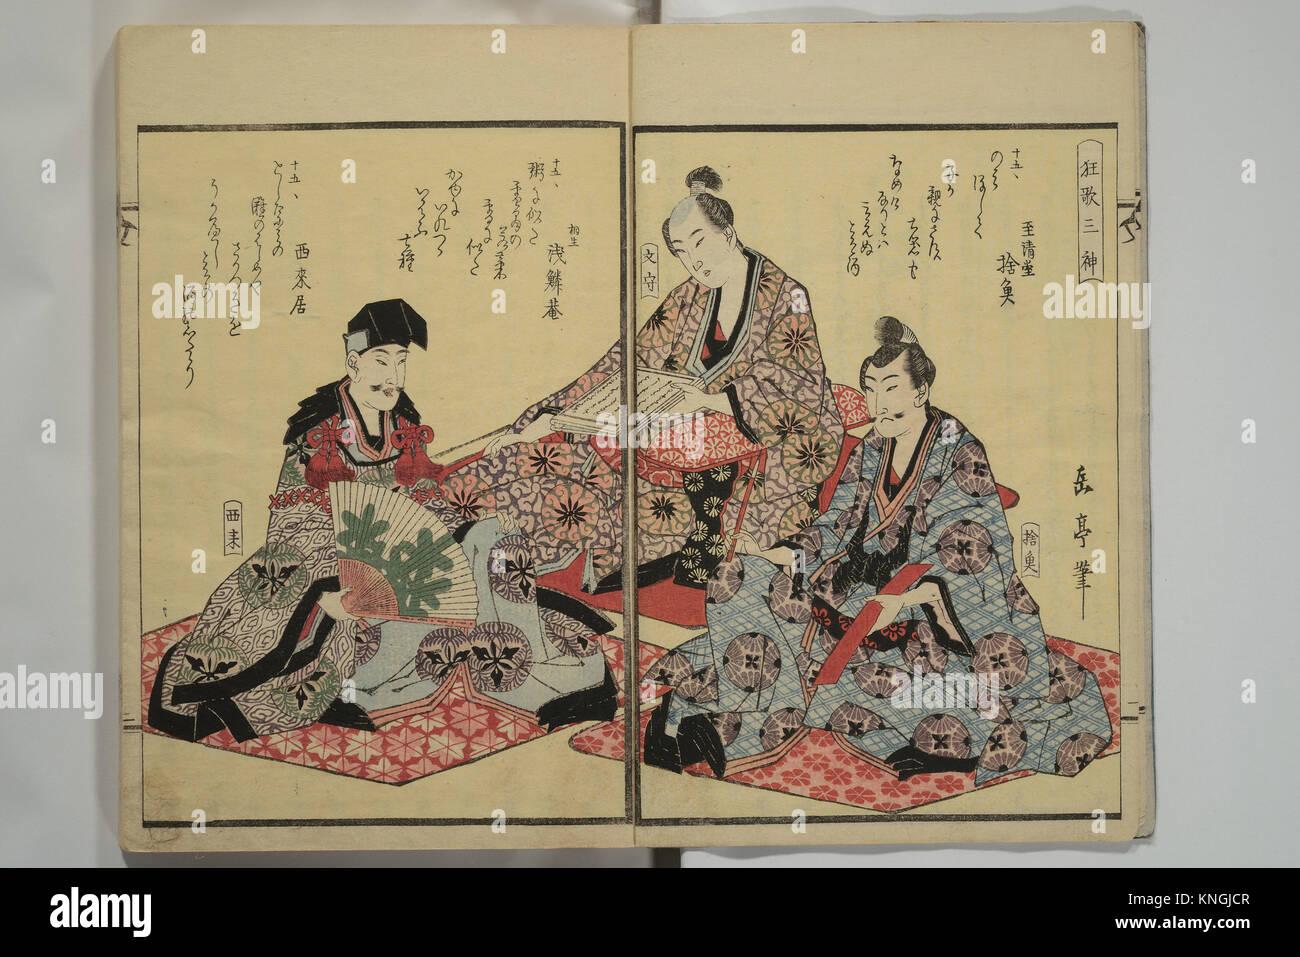 Collection of Kyoka Verse with Portraits of Poets in Famous Numerical Groupings (Kyoka meisu gazo shu). Artist: - Stock Image